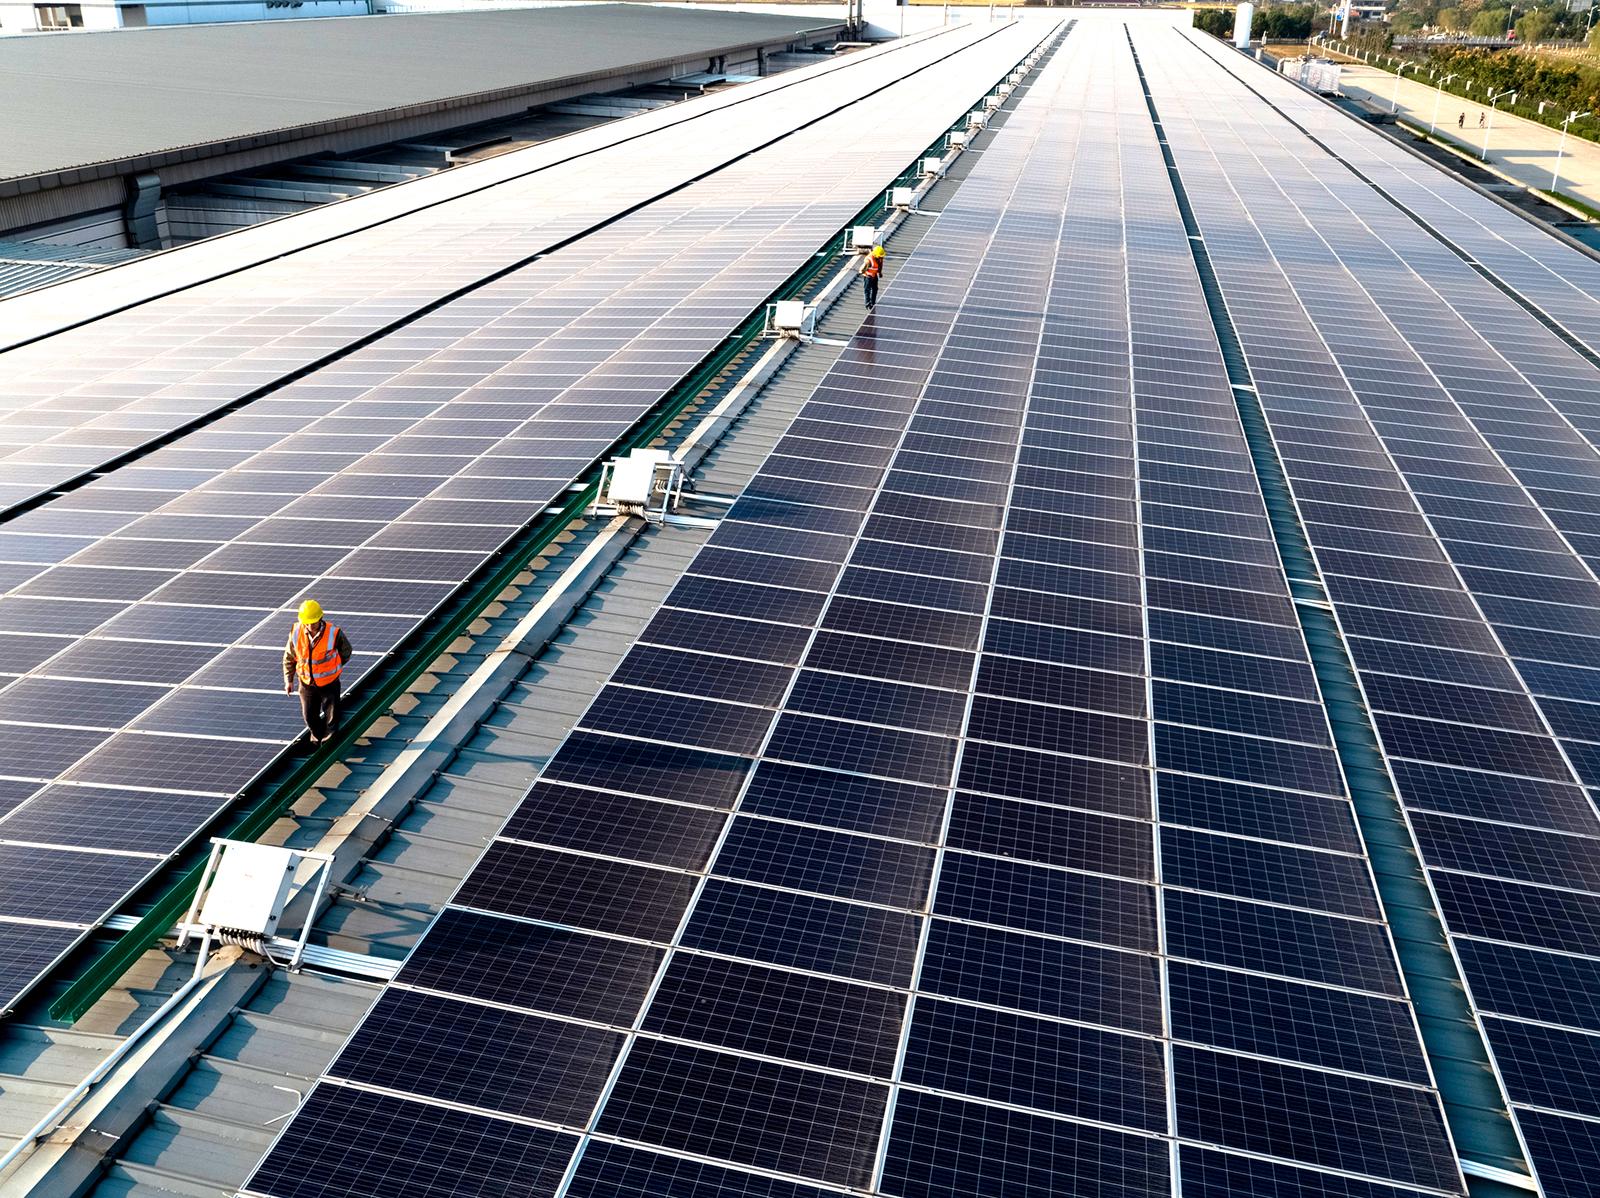 Paneles solares financiados por Apple